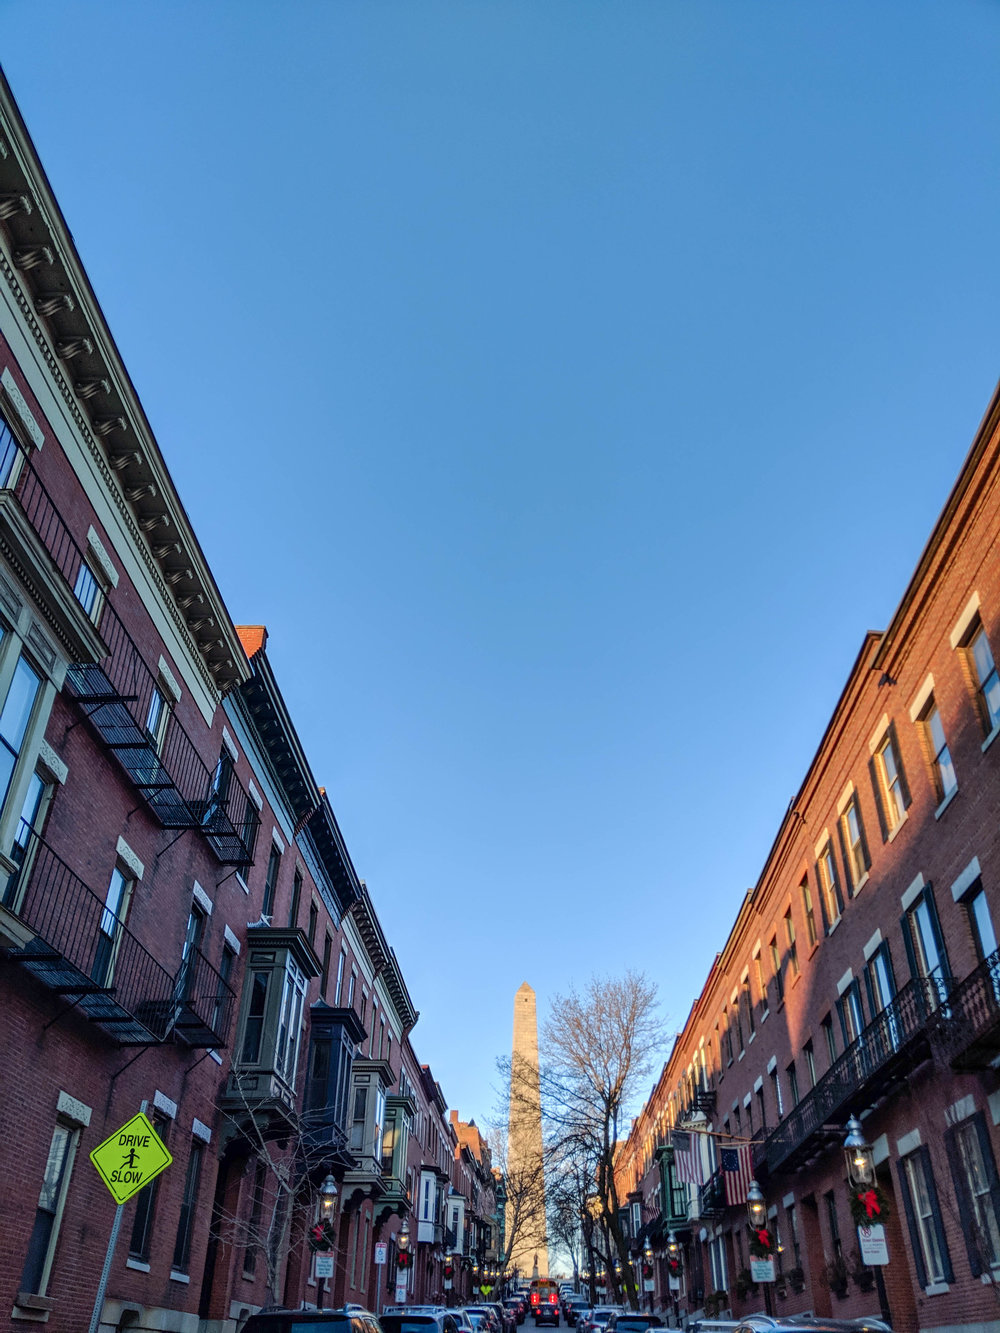 bri rinehart; photography; boston; charlestown; bunker hill monument